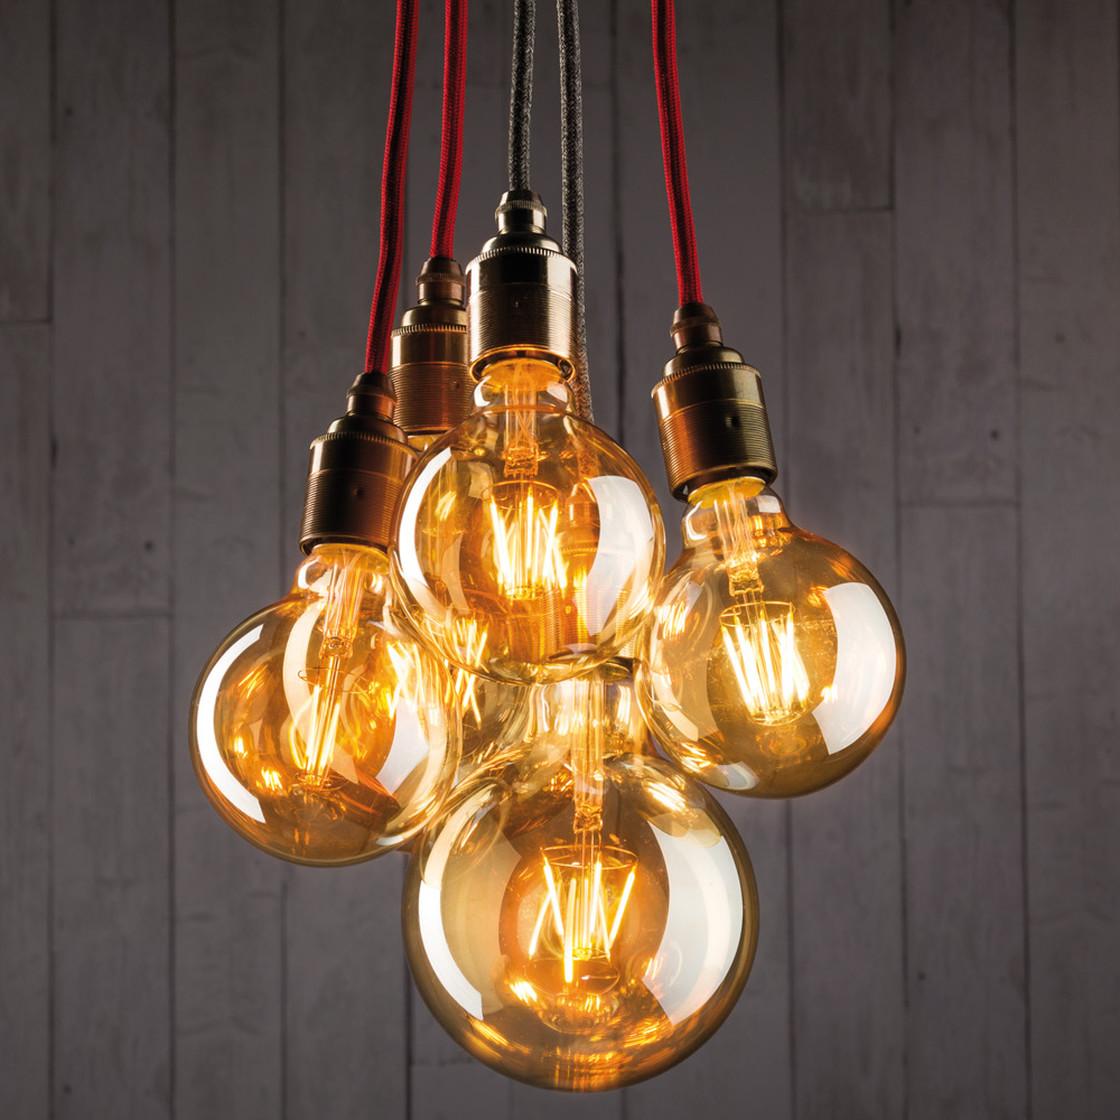 paulmann led filament vintage globe125 retrolampe 4w e27 gold 14 99. Black Bedroom Furniture Sets. Home Design Ideas